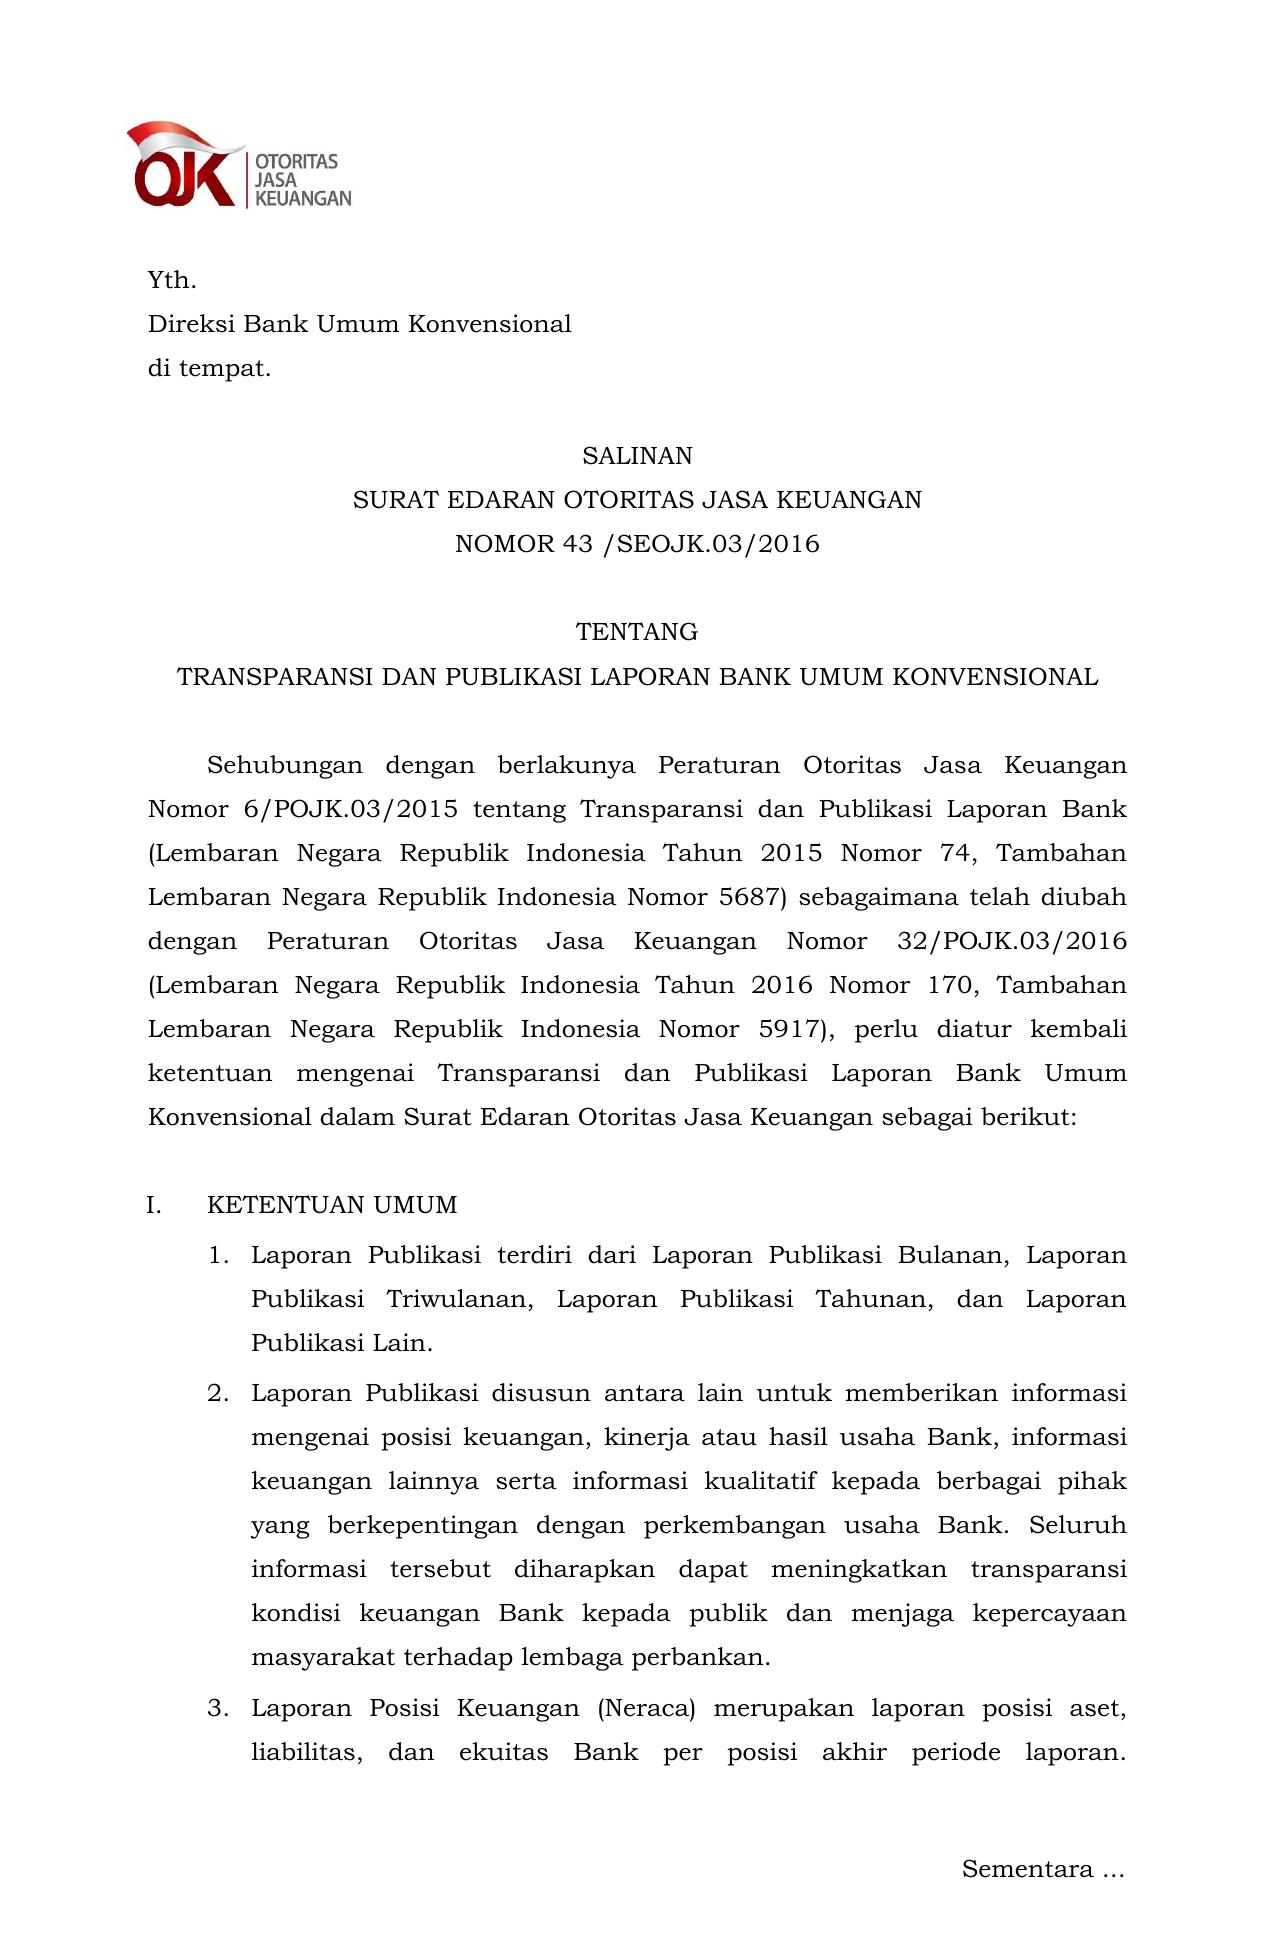 Pedoman Penyusunan Laporan Publikasi Bank Sikepo